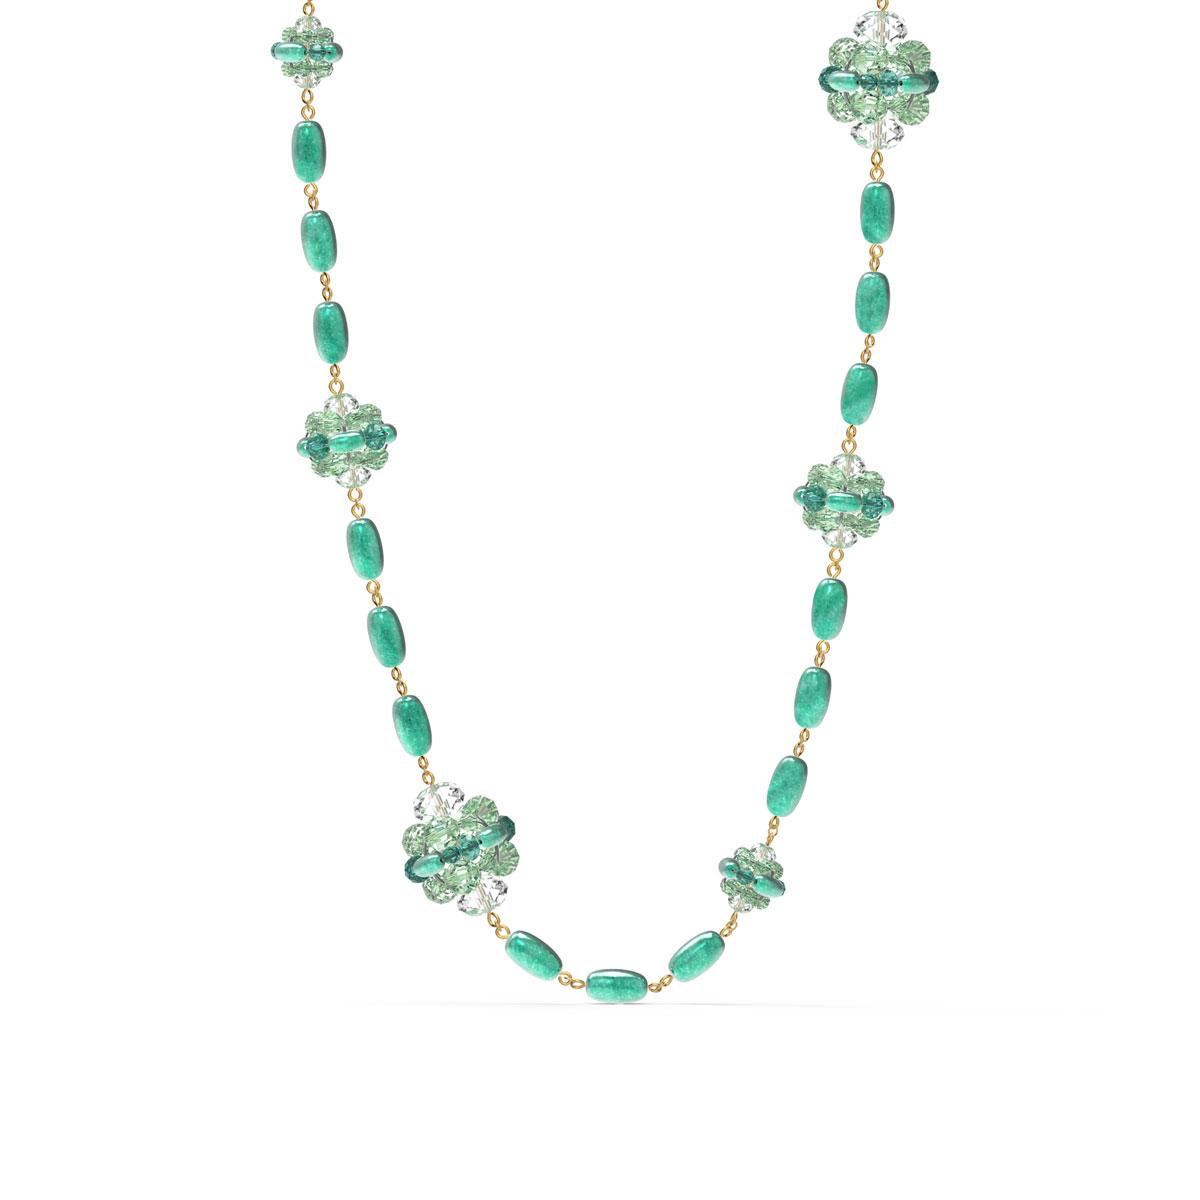 Swarovski Somnia Necklace, Green, Gold-Tone Plated